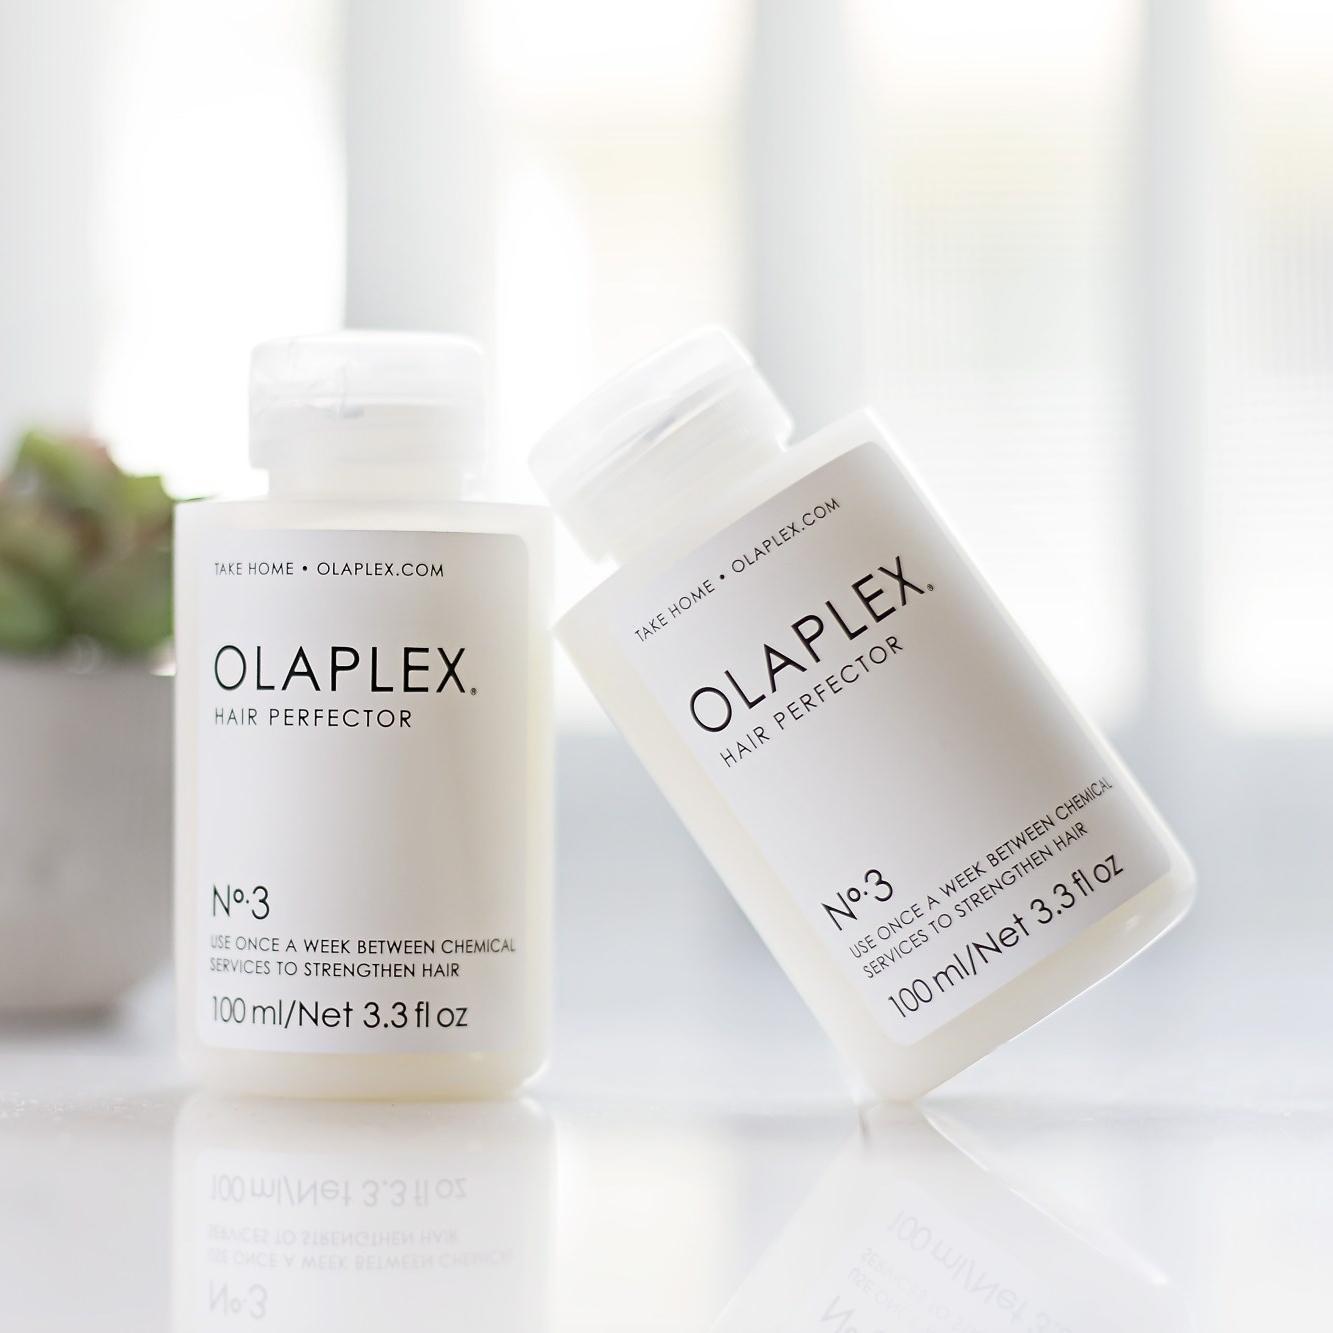 olaplex (1).jpg